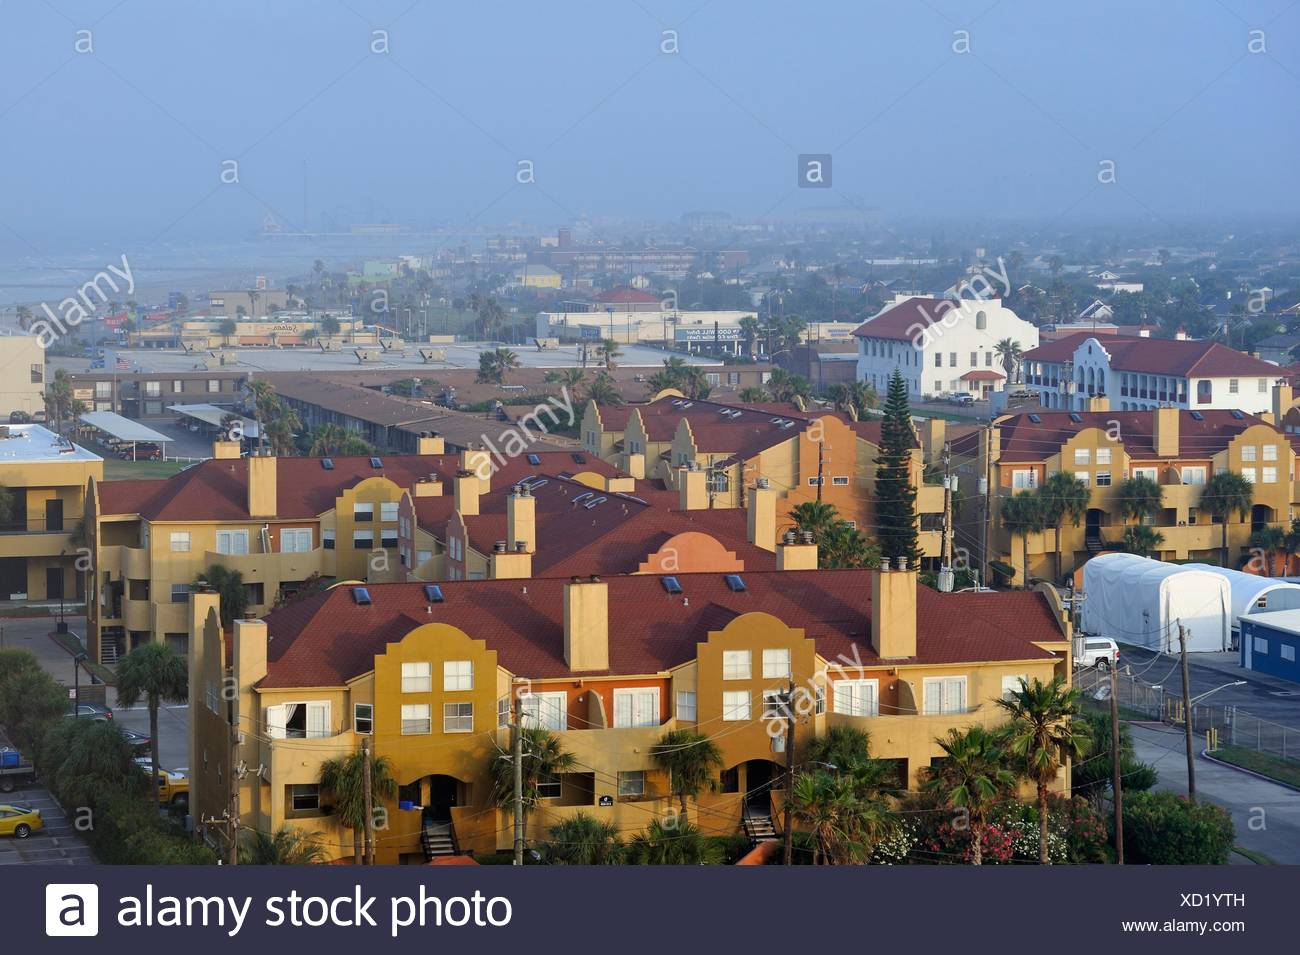 Galveston island, Gulf of Mexico, Texas, United States of America, North America. - Stock Image